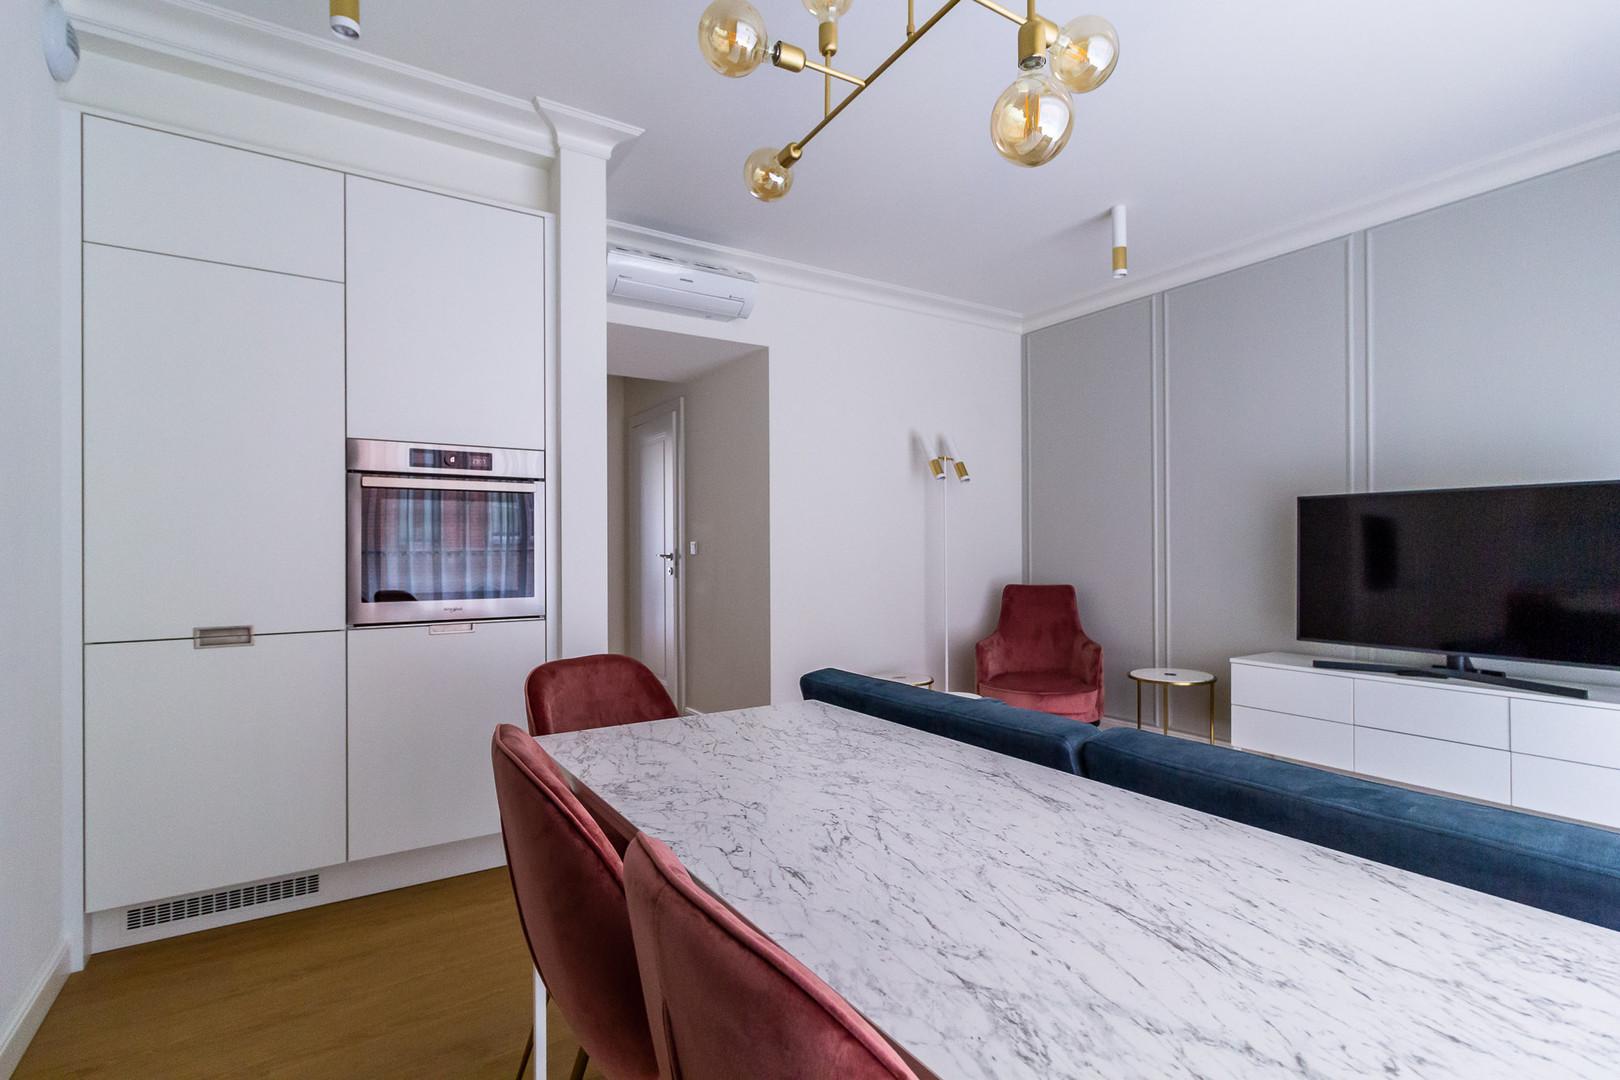 Property to rent Poznan Poland-10.jpg